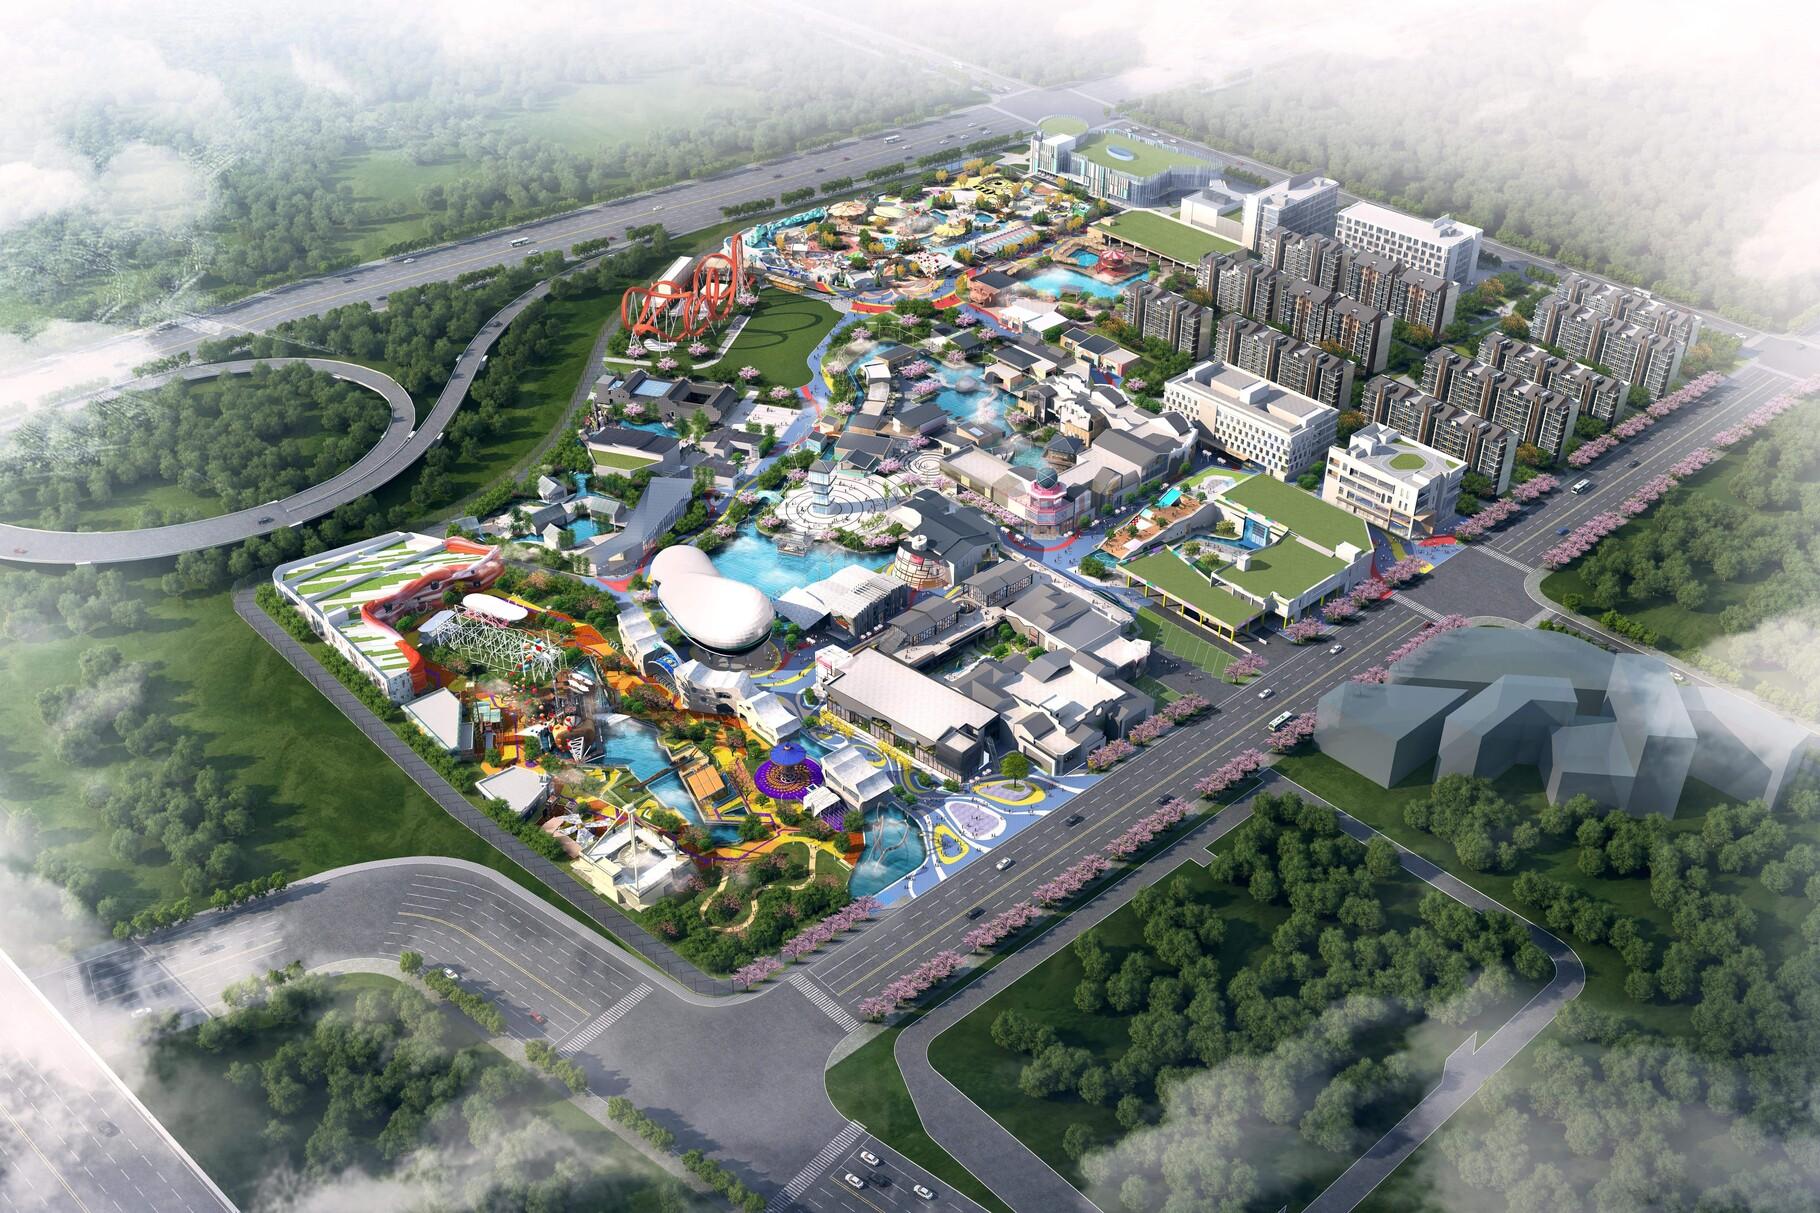 oct-theme-parks-happy-valley-01204700.jpg